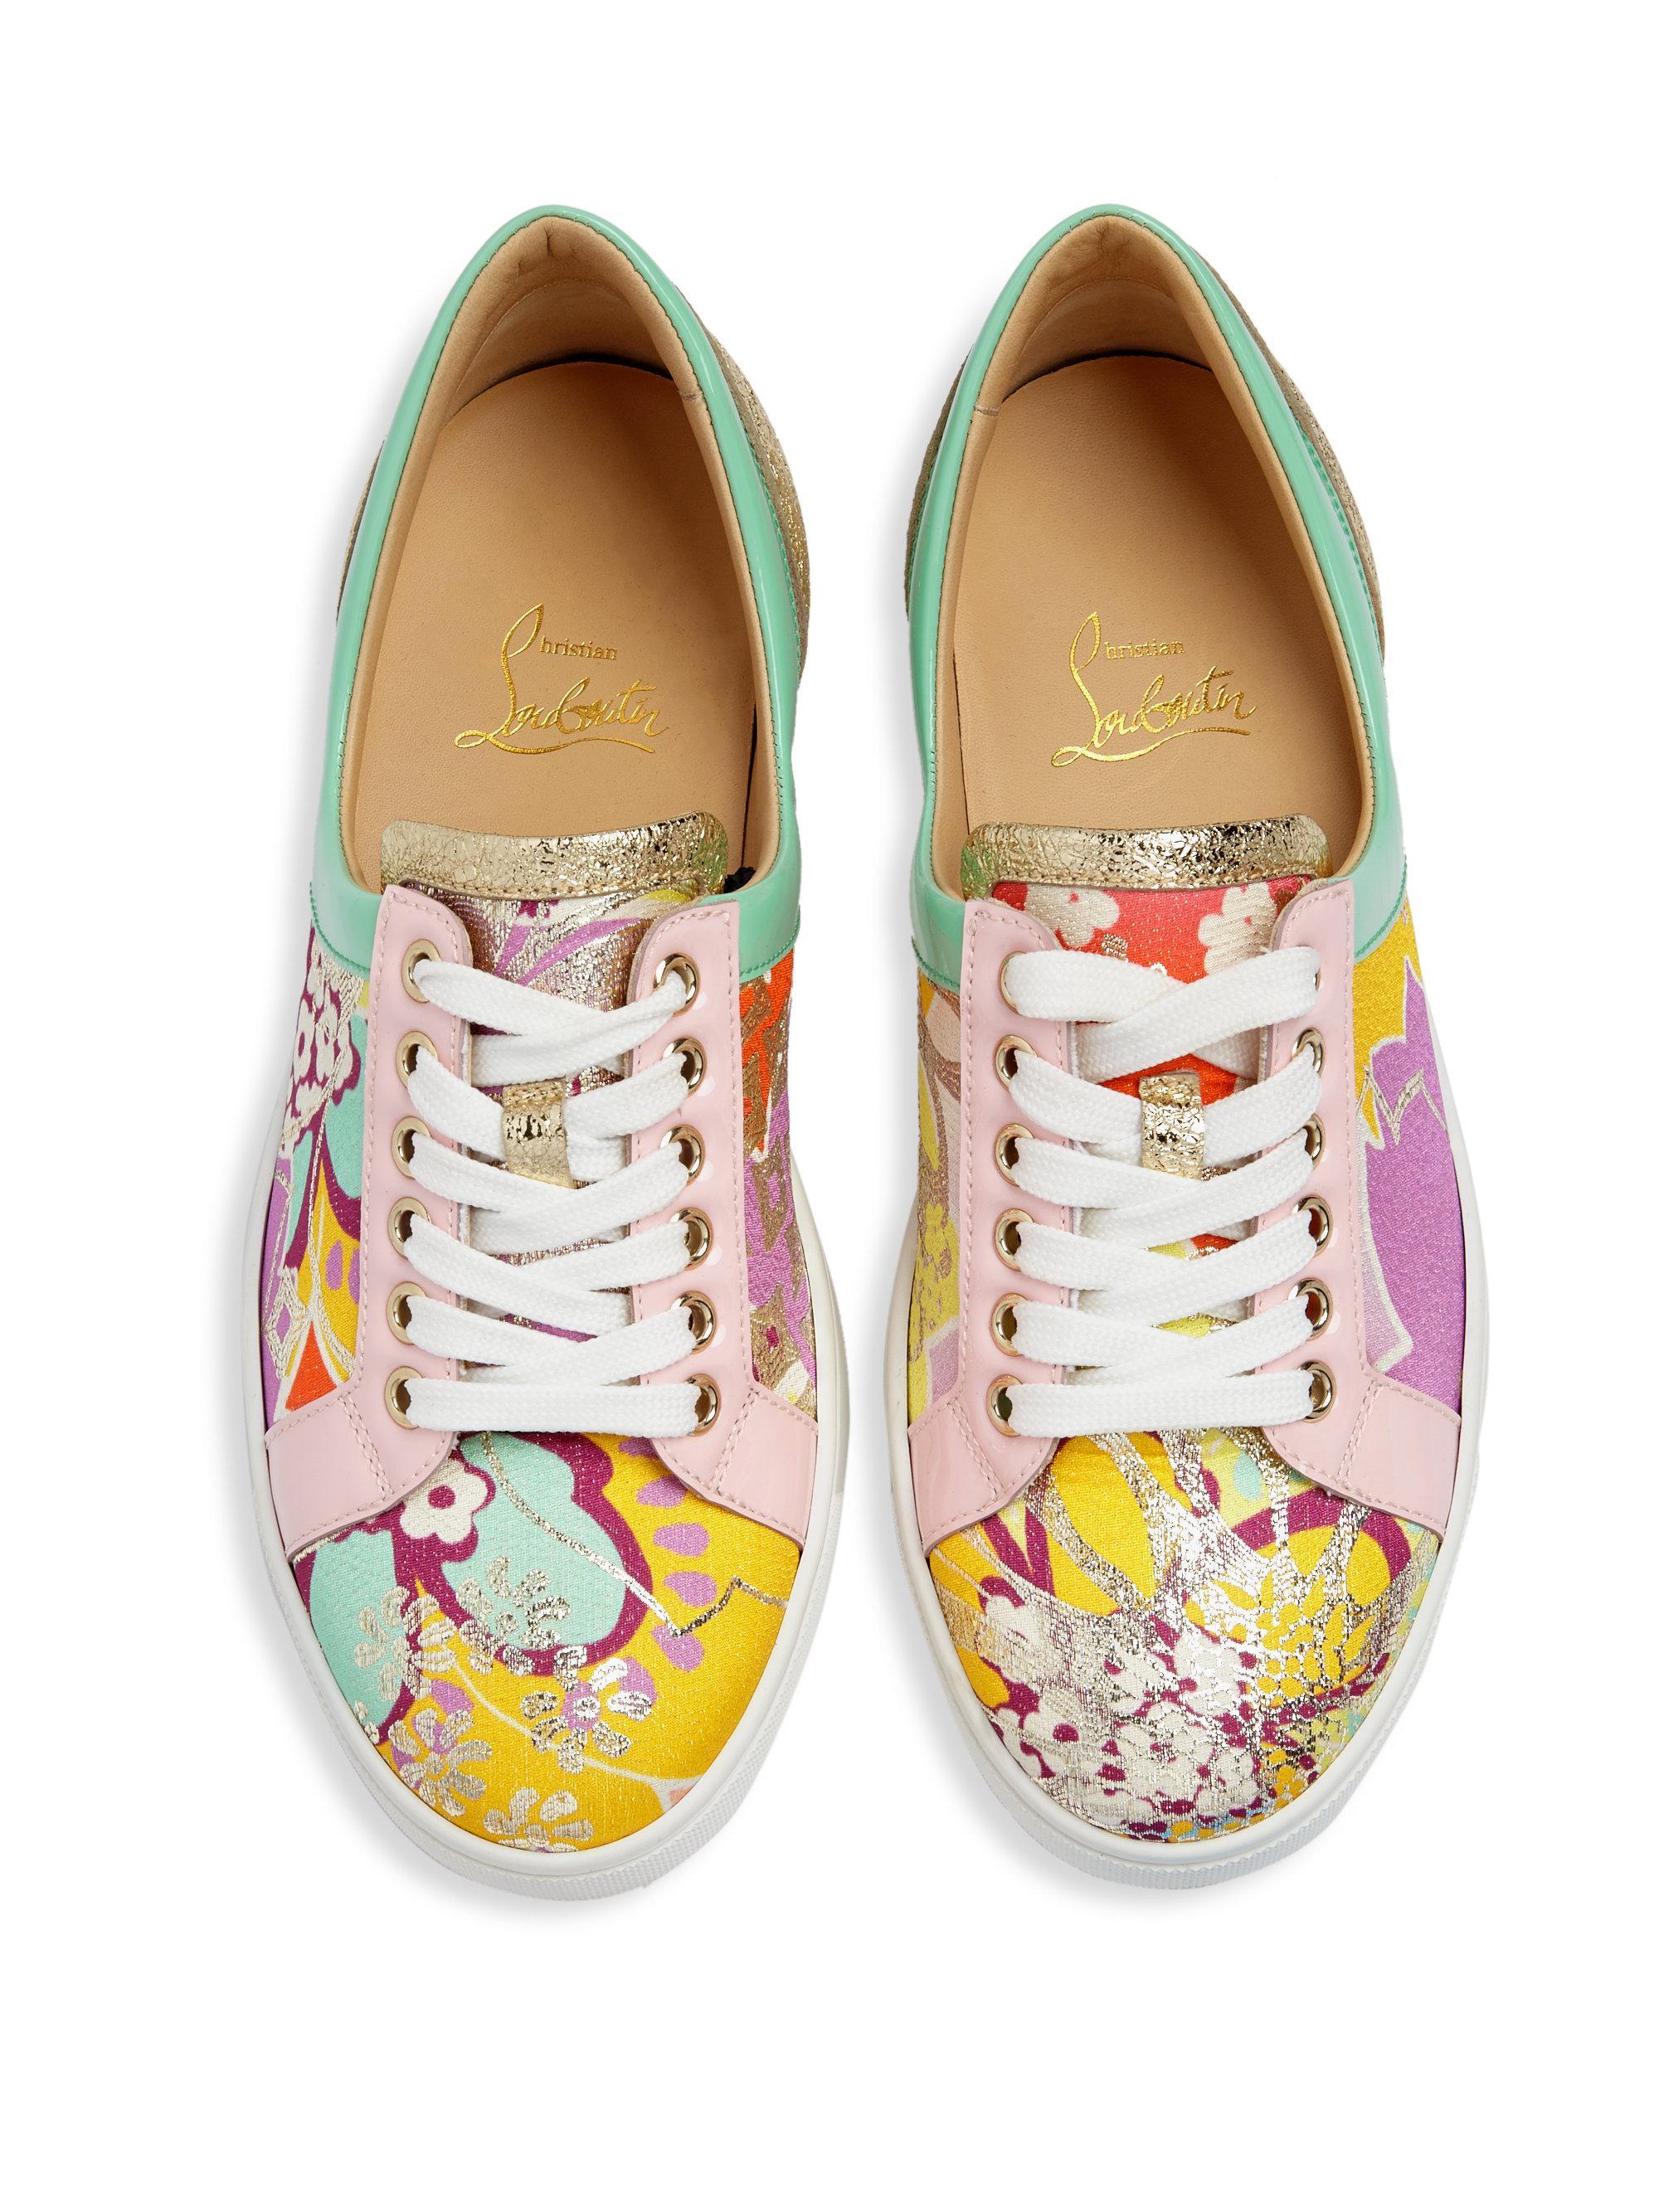 acd51bea45e Christian Louboutin Multicolor Flamingirl Glitter Sneakers